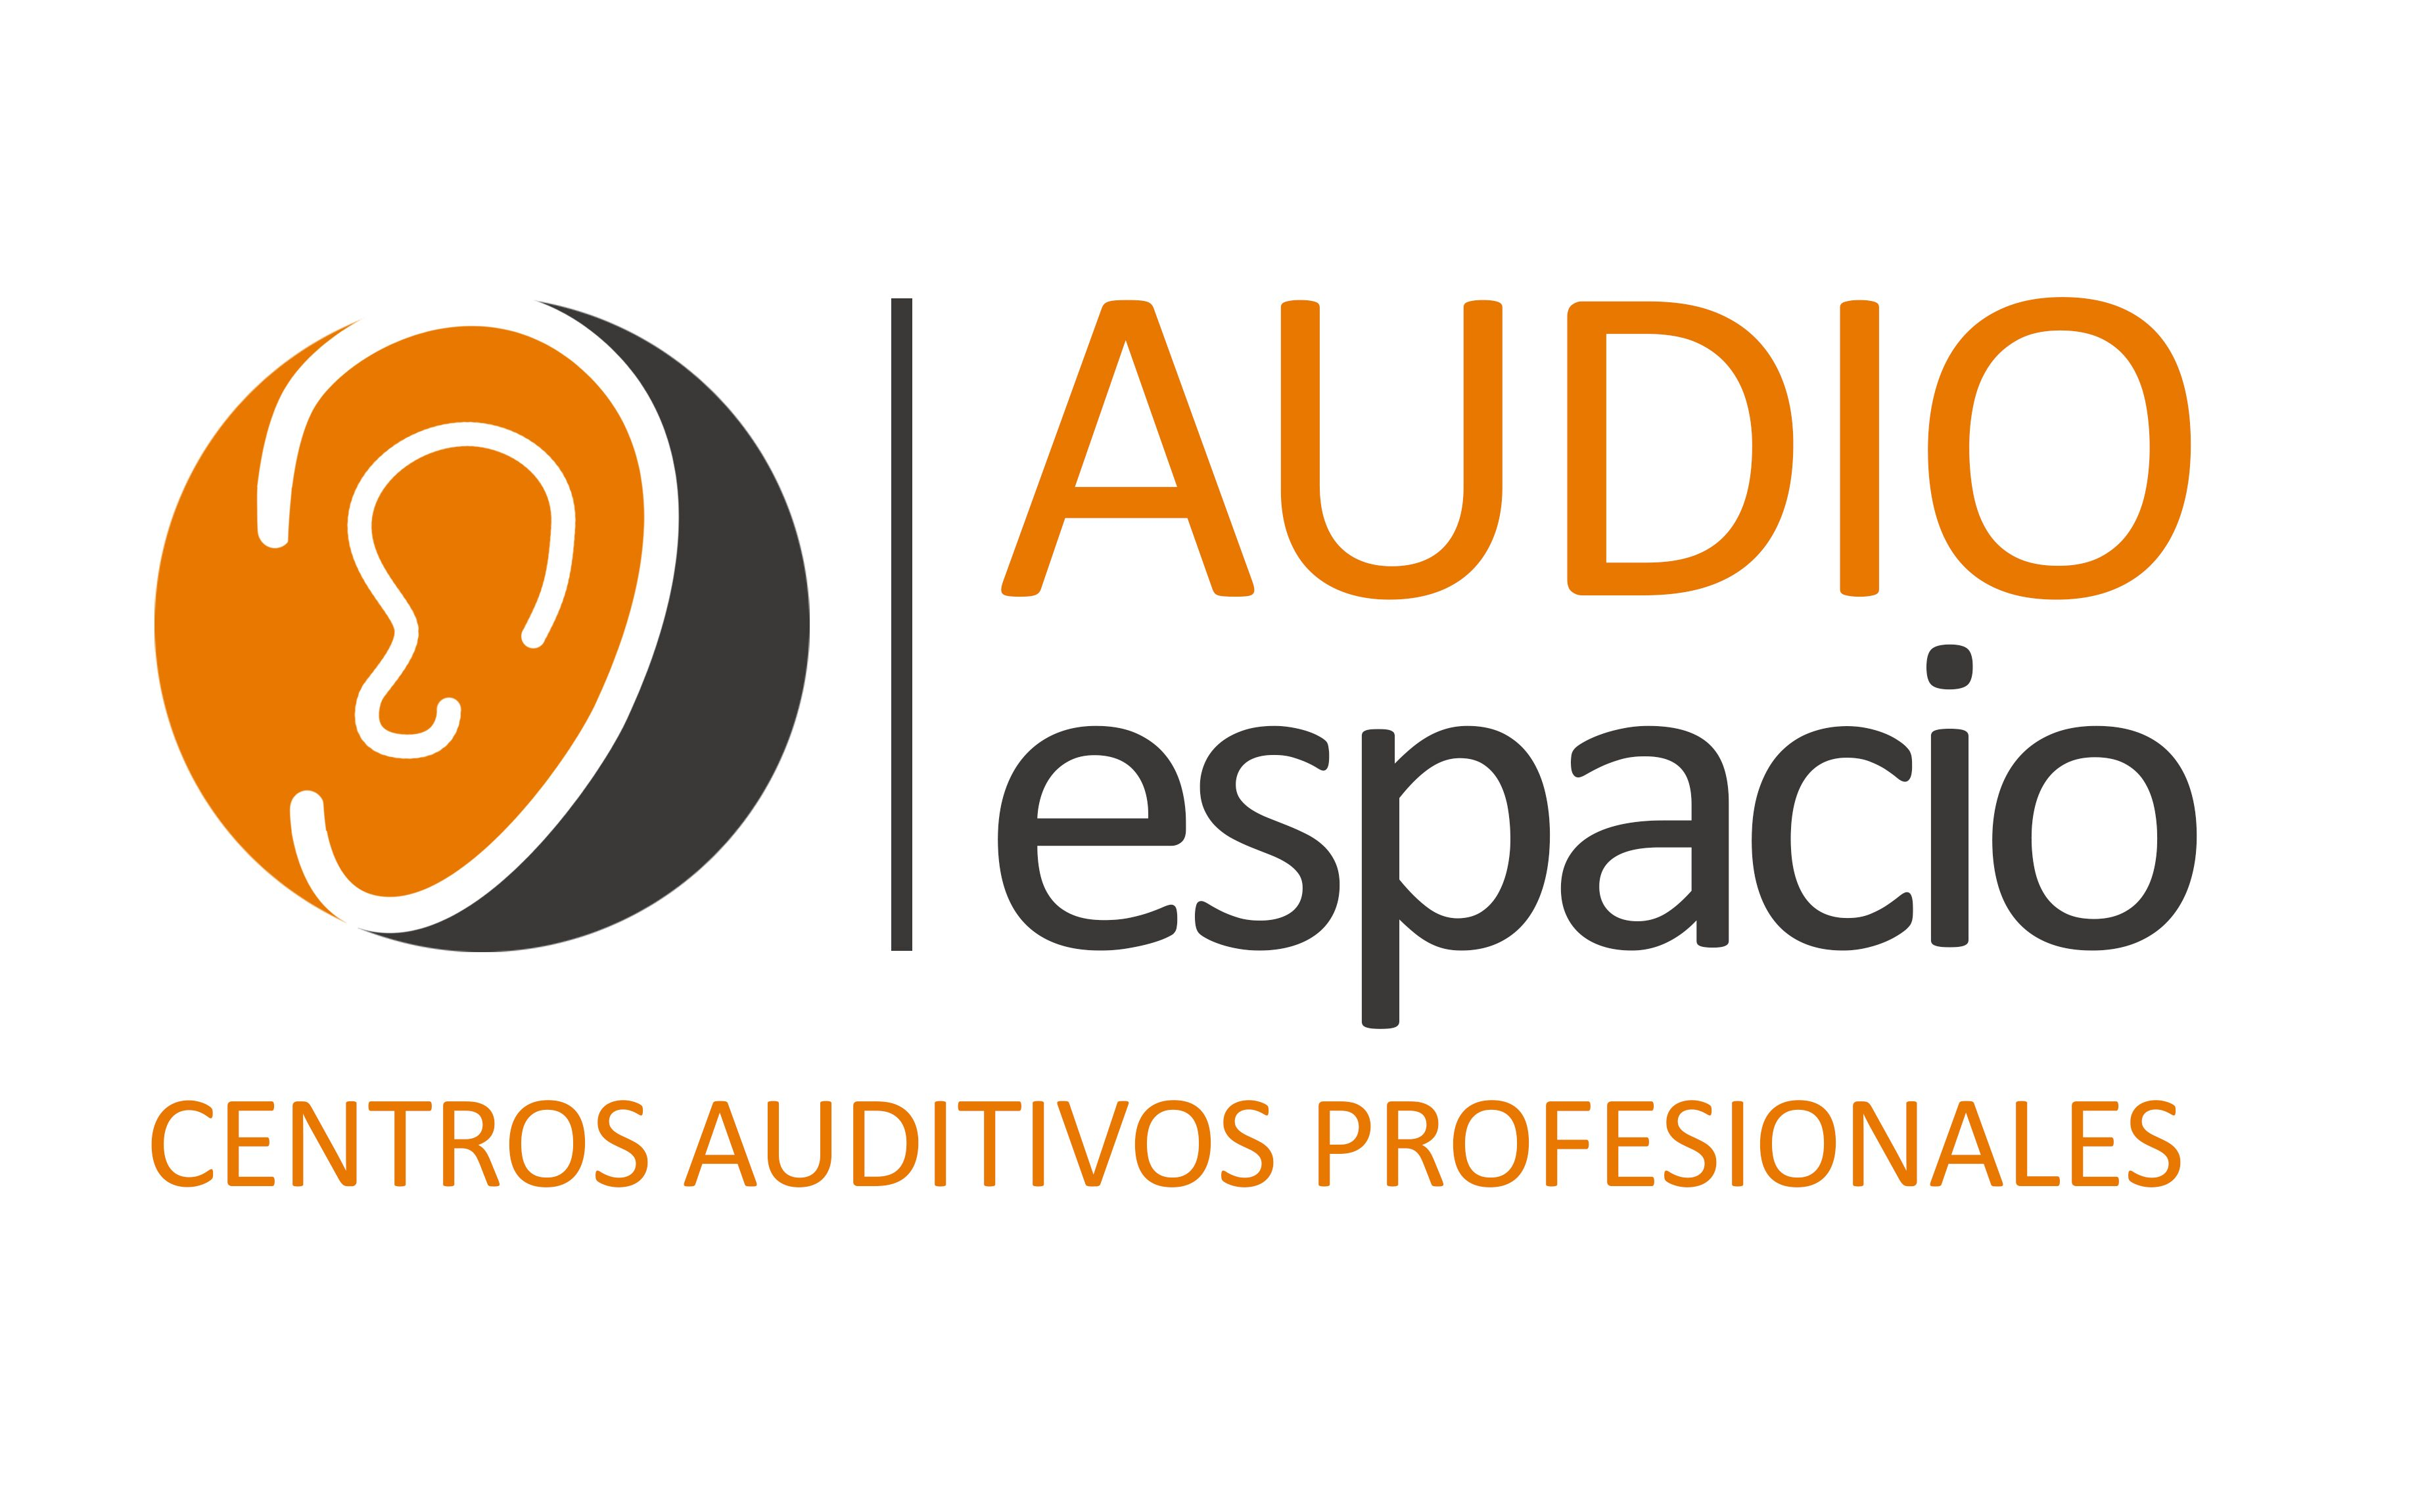 Audio espacio